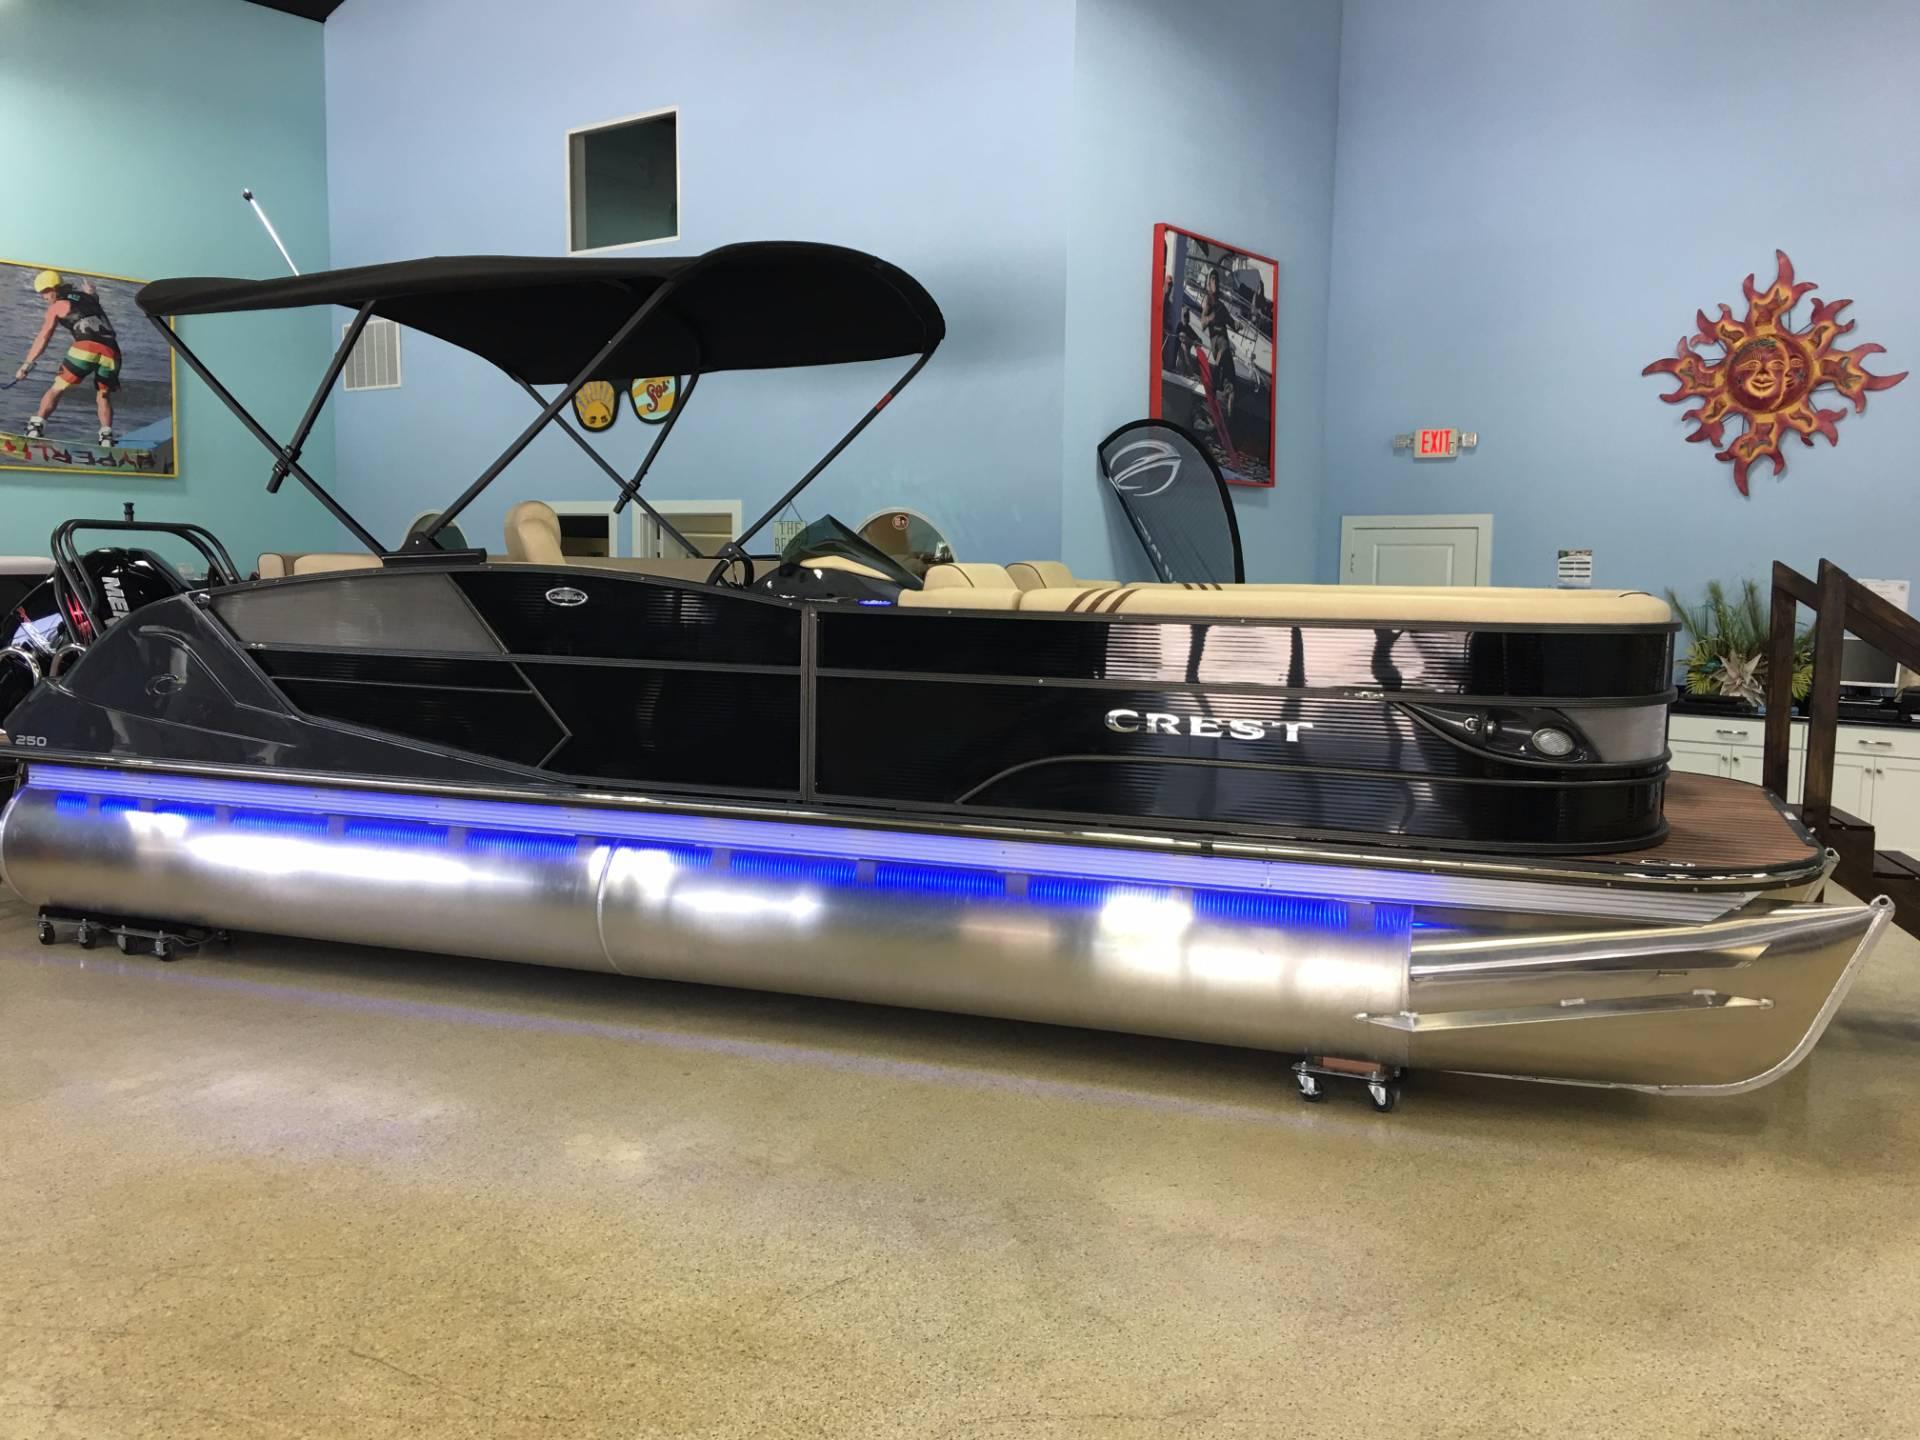 Crest Pontoon Boats Caribbean 250 L